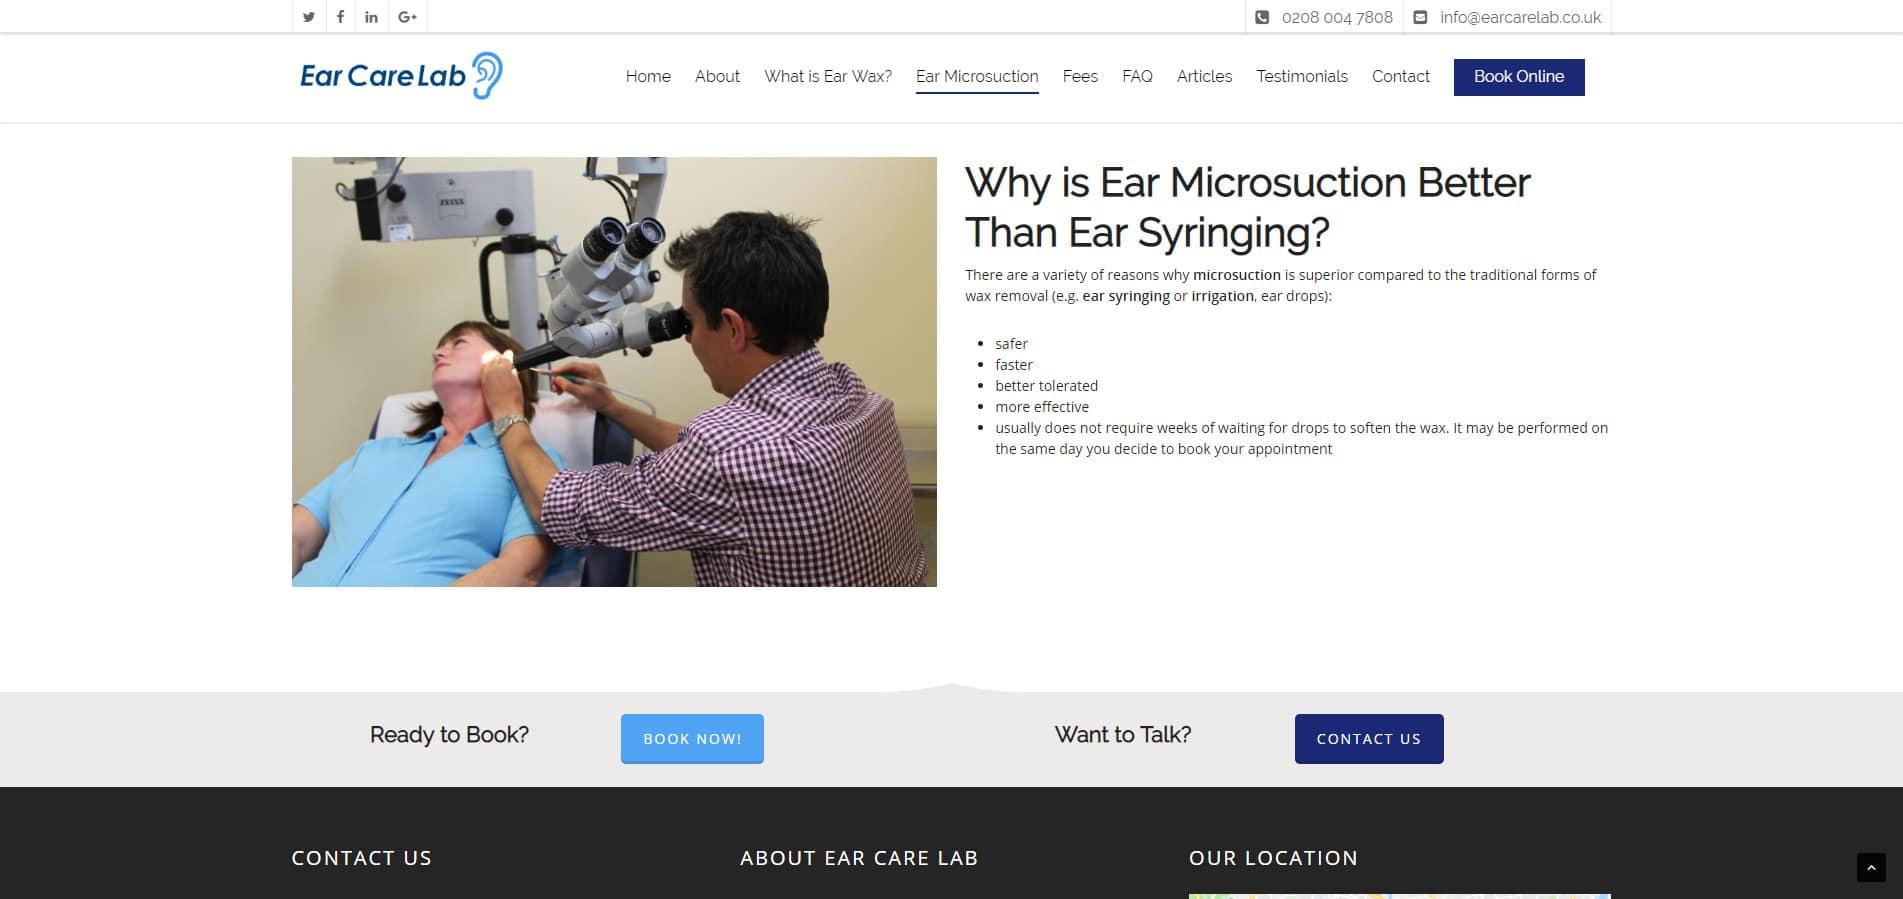 Ear Care Lab